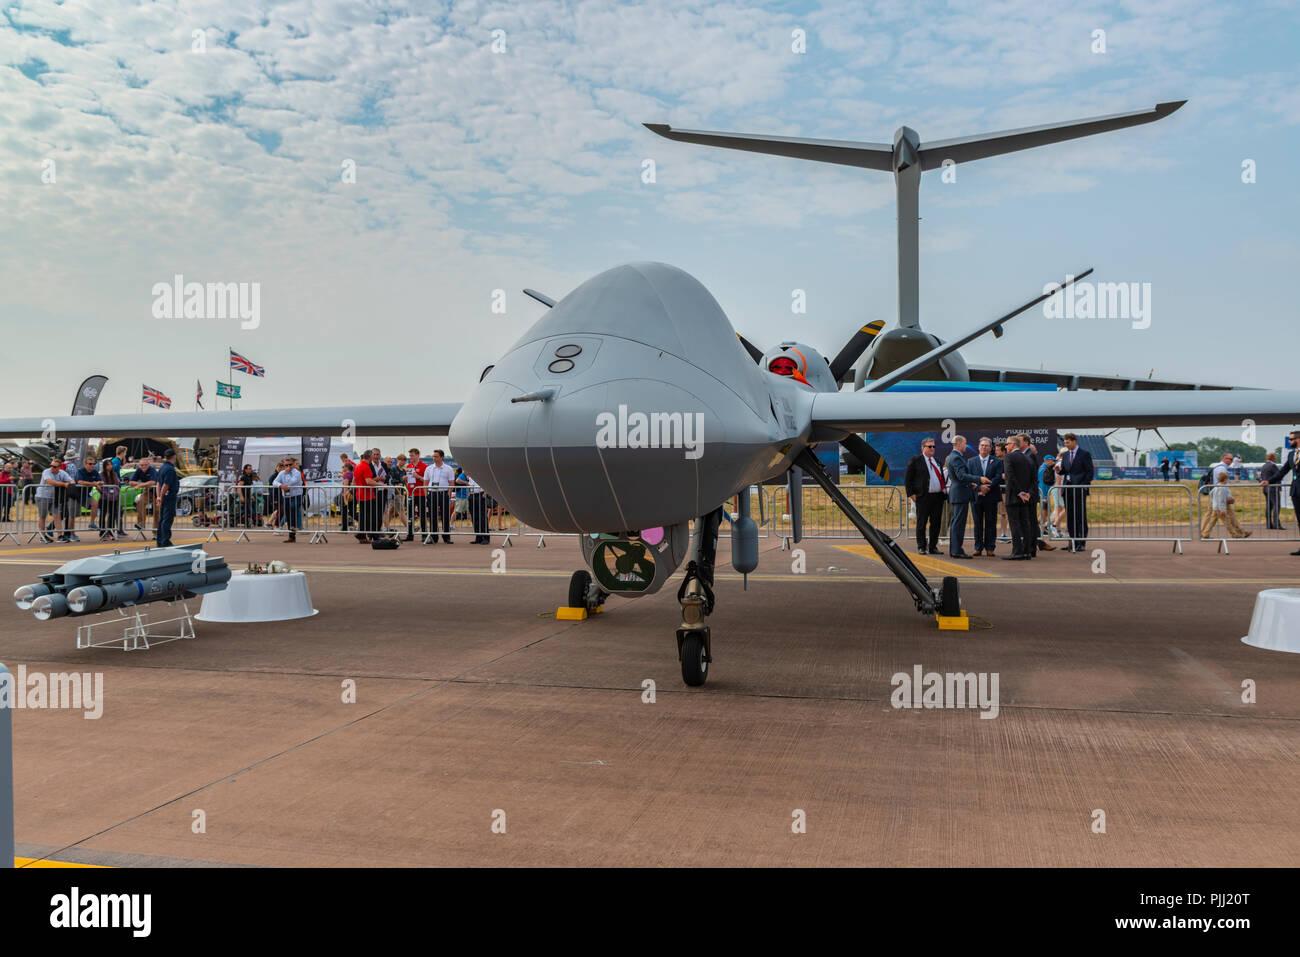 General Atomics Aeronautical Systems' MQ-9B SkyGuardian, RIAT 2018, UK - Stock Image